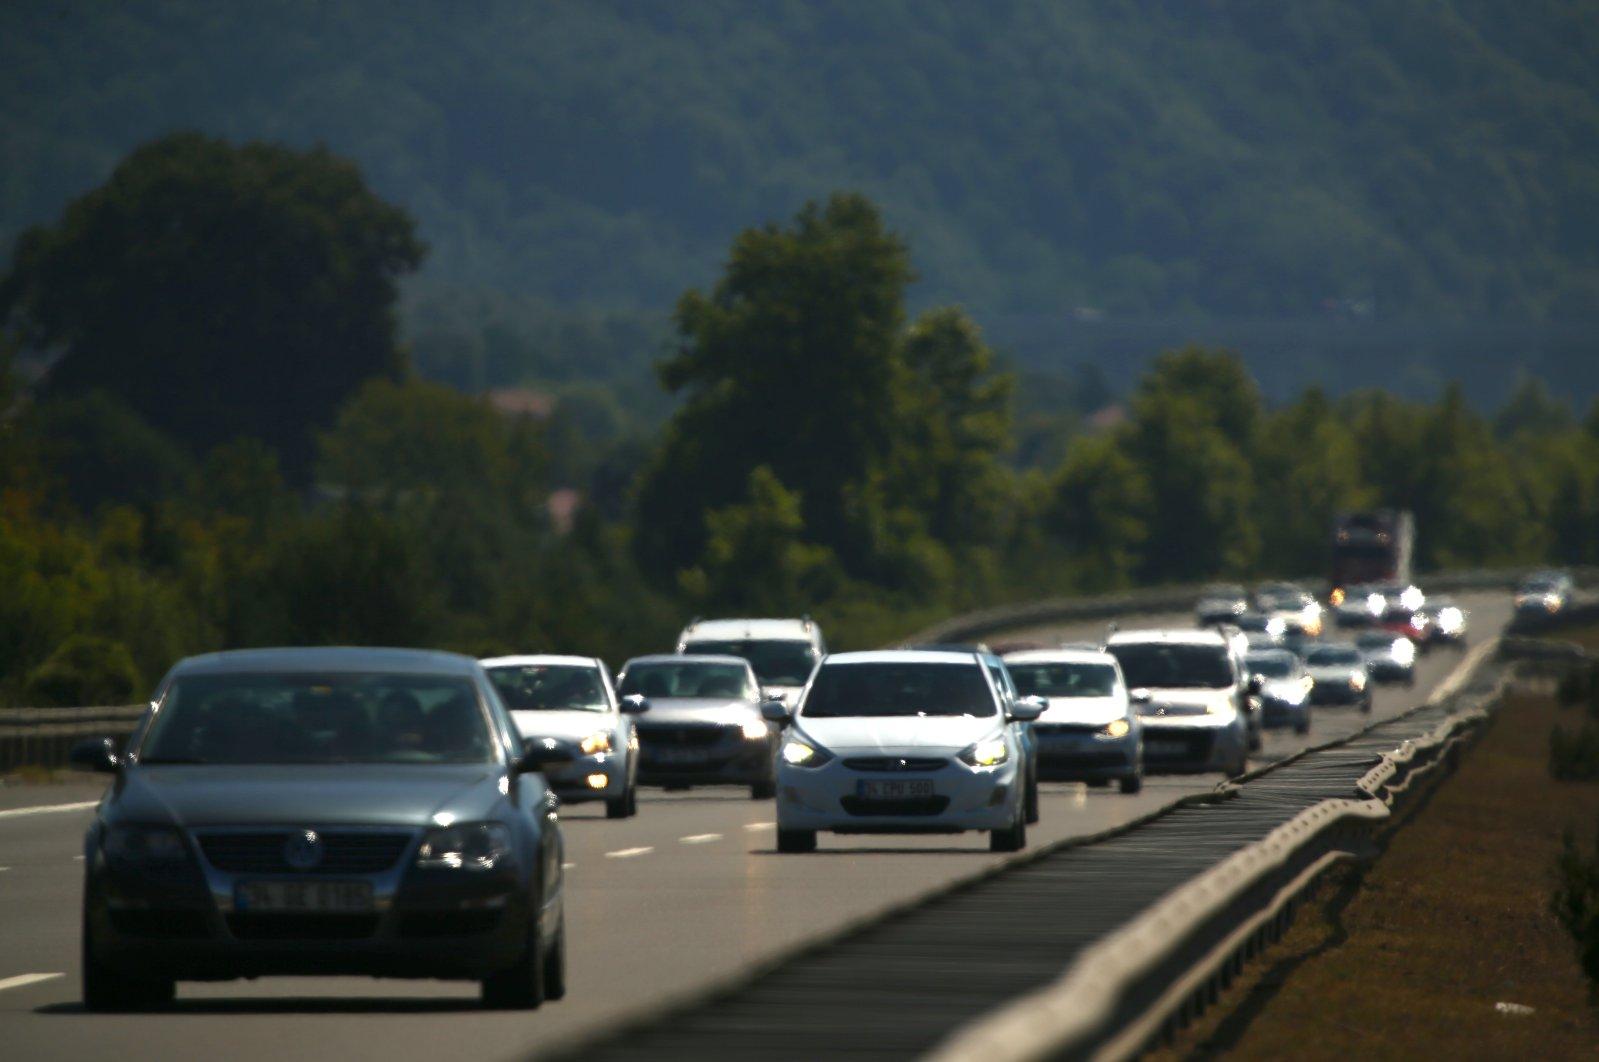 Cars are seen on the Düzce-Bolu section of the Anatolian Highway, northwestern Turkey, Aug. 3, 2020. (AA Photo)